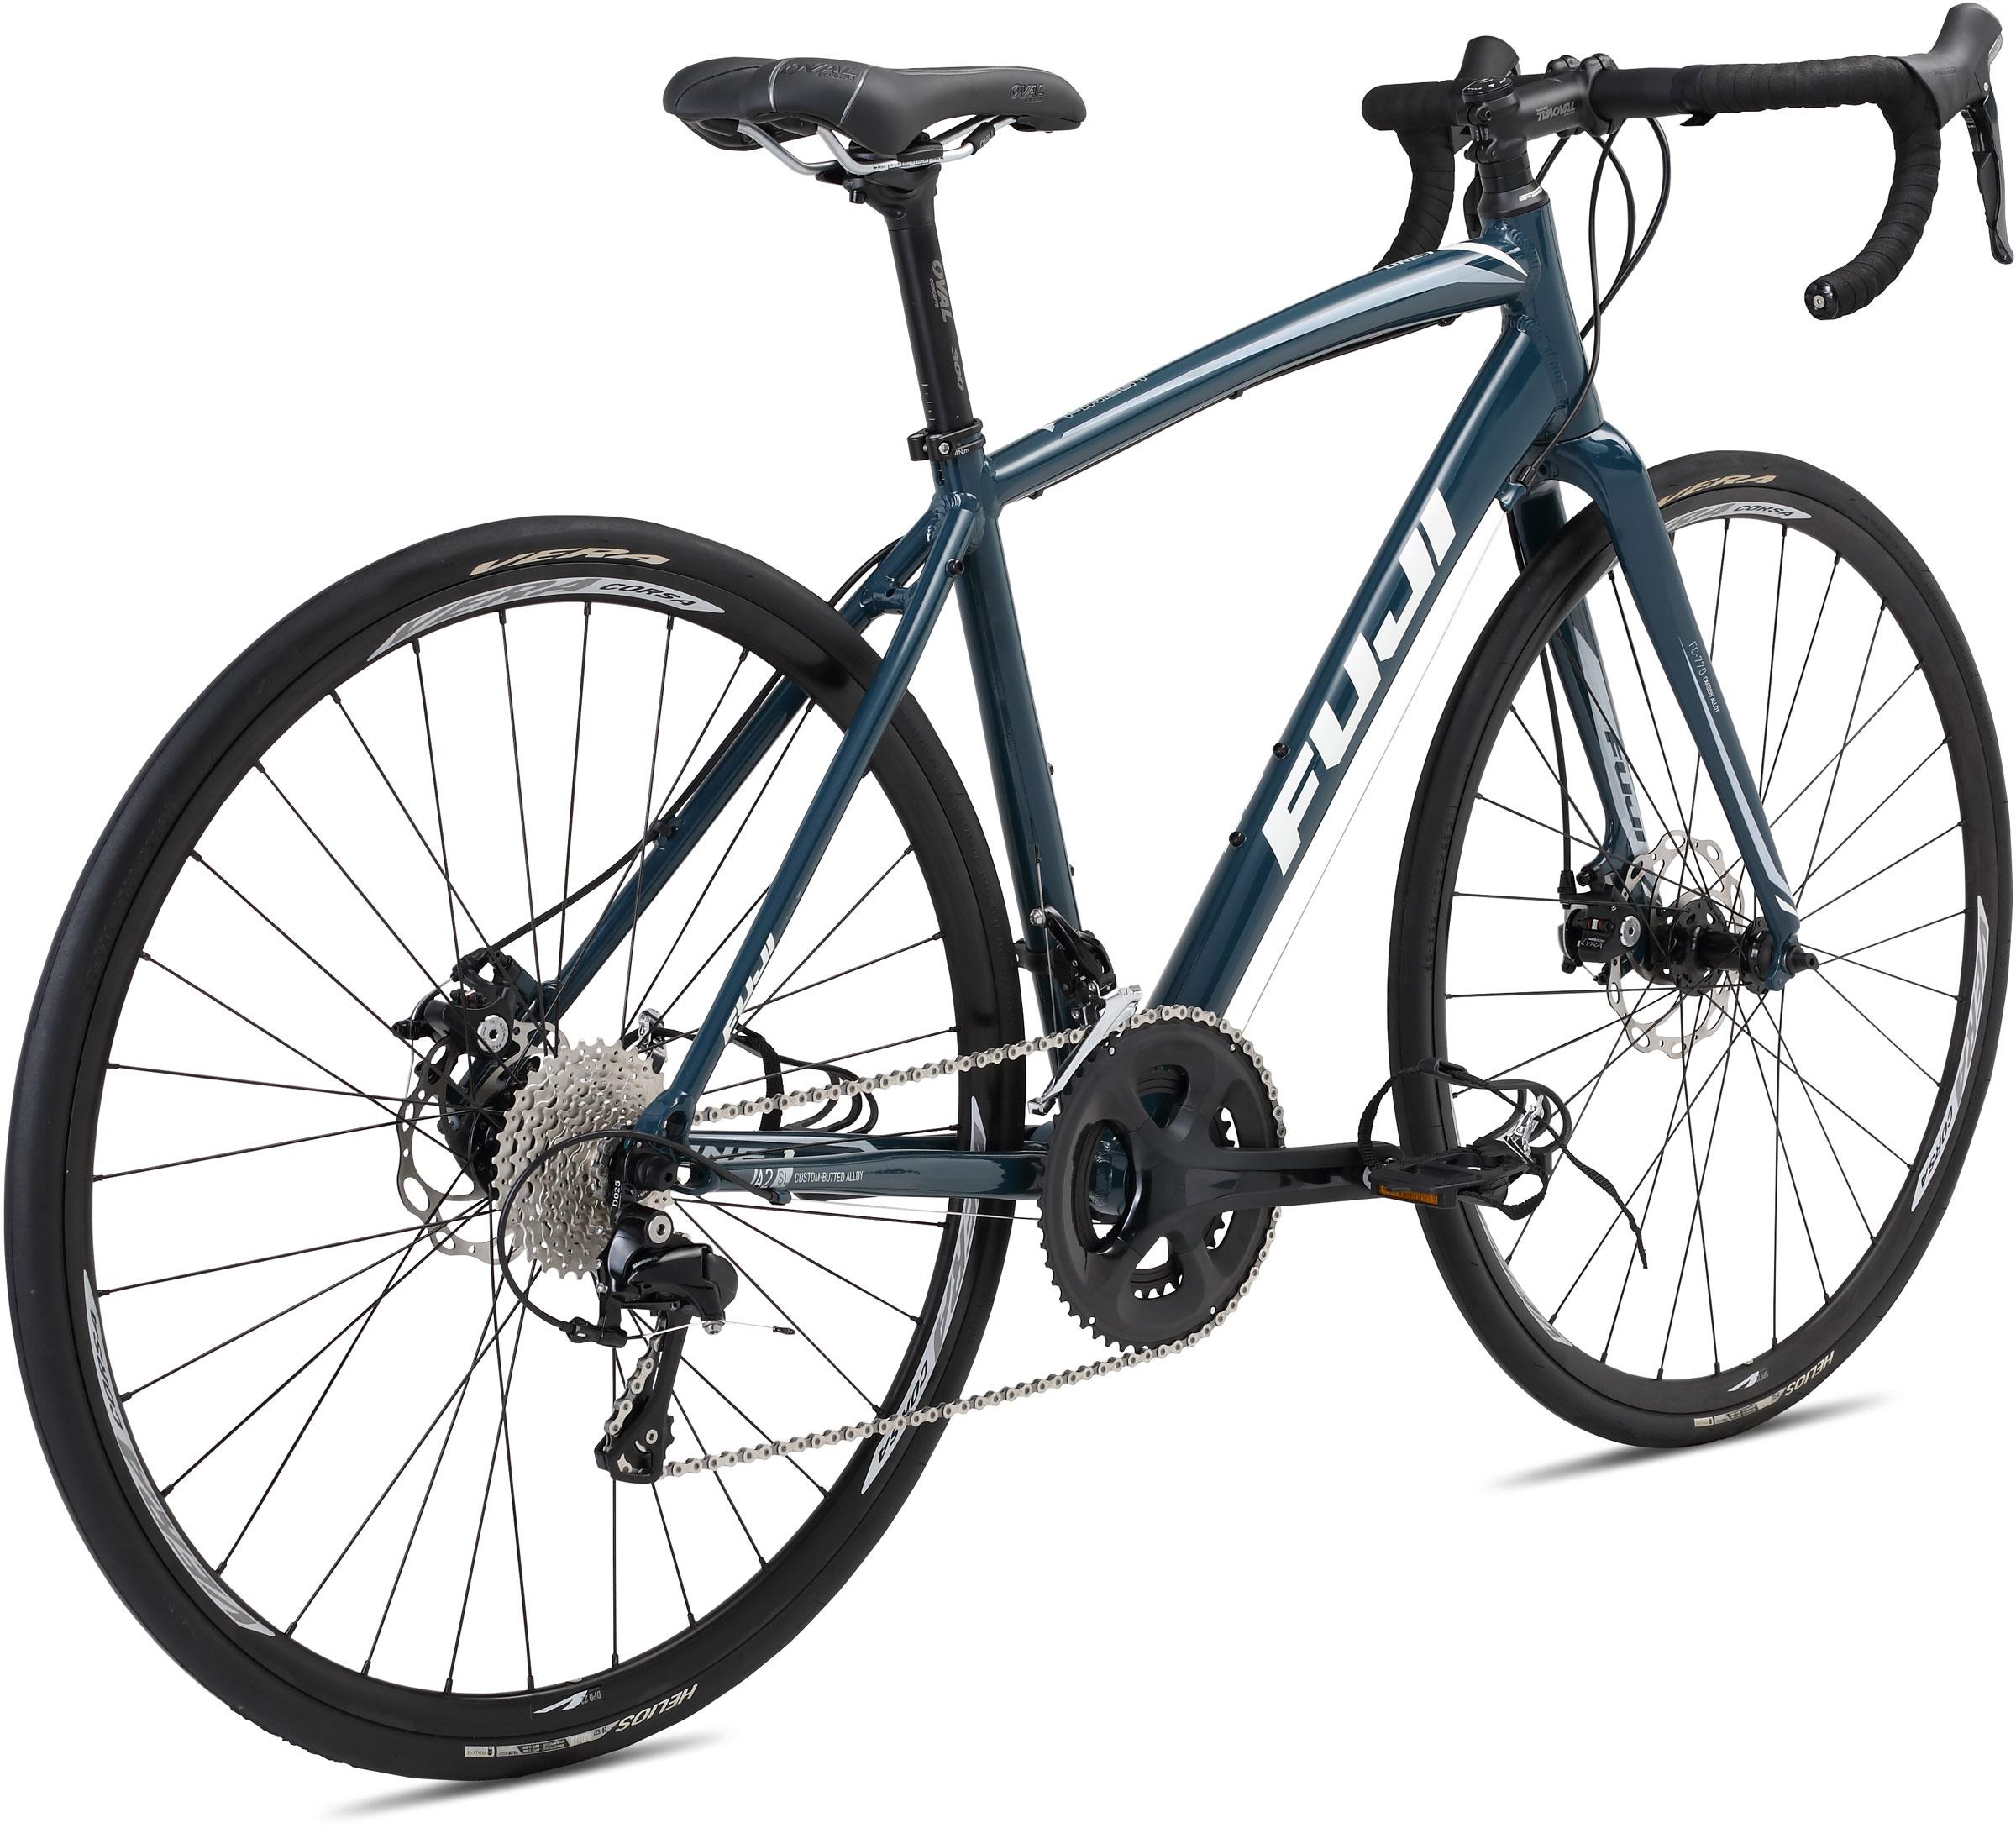 9e268aeedfc Fuji Finest 1.1 - Women's - Danny's Cycles